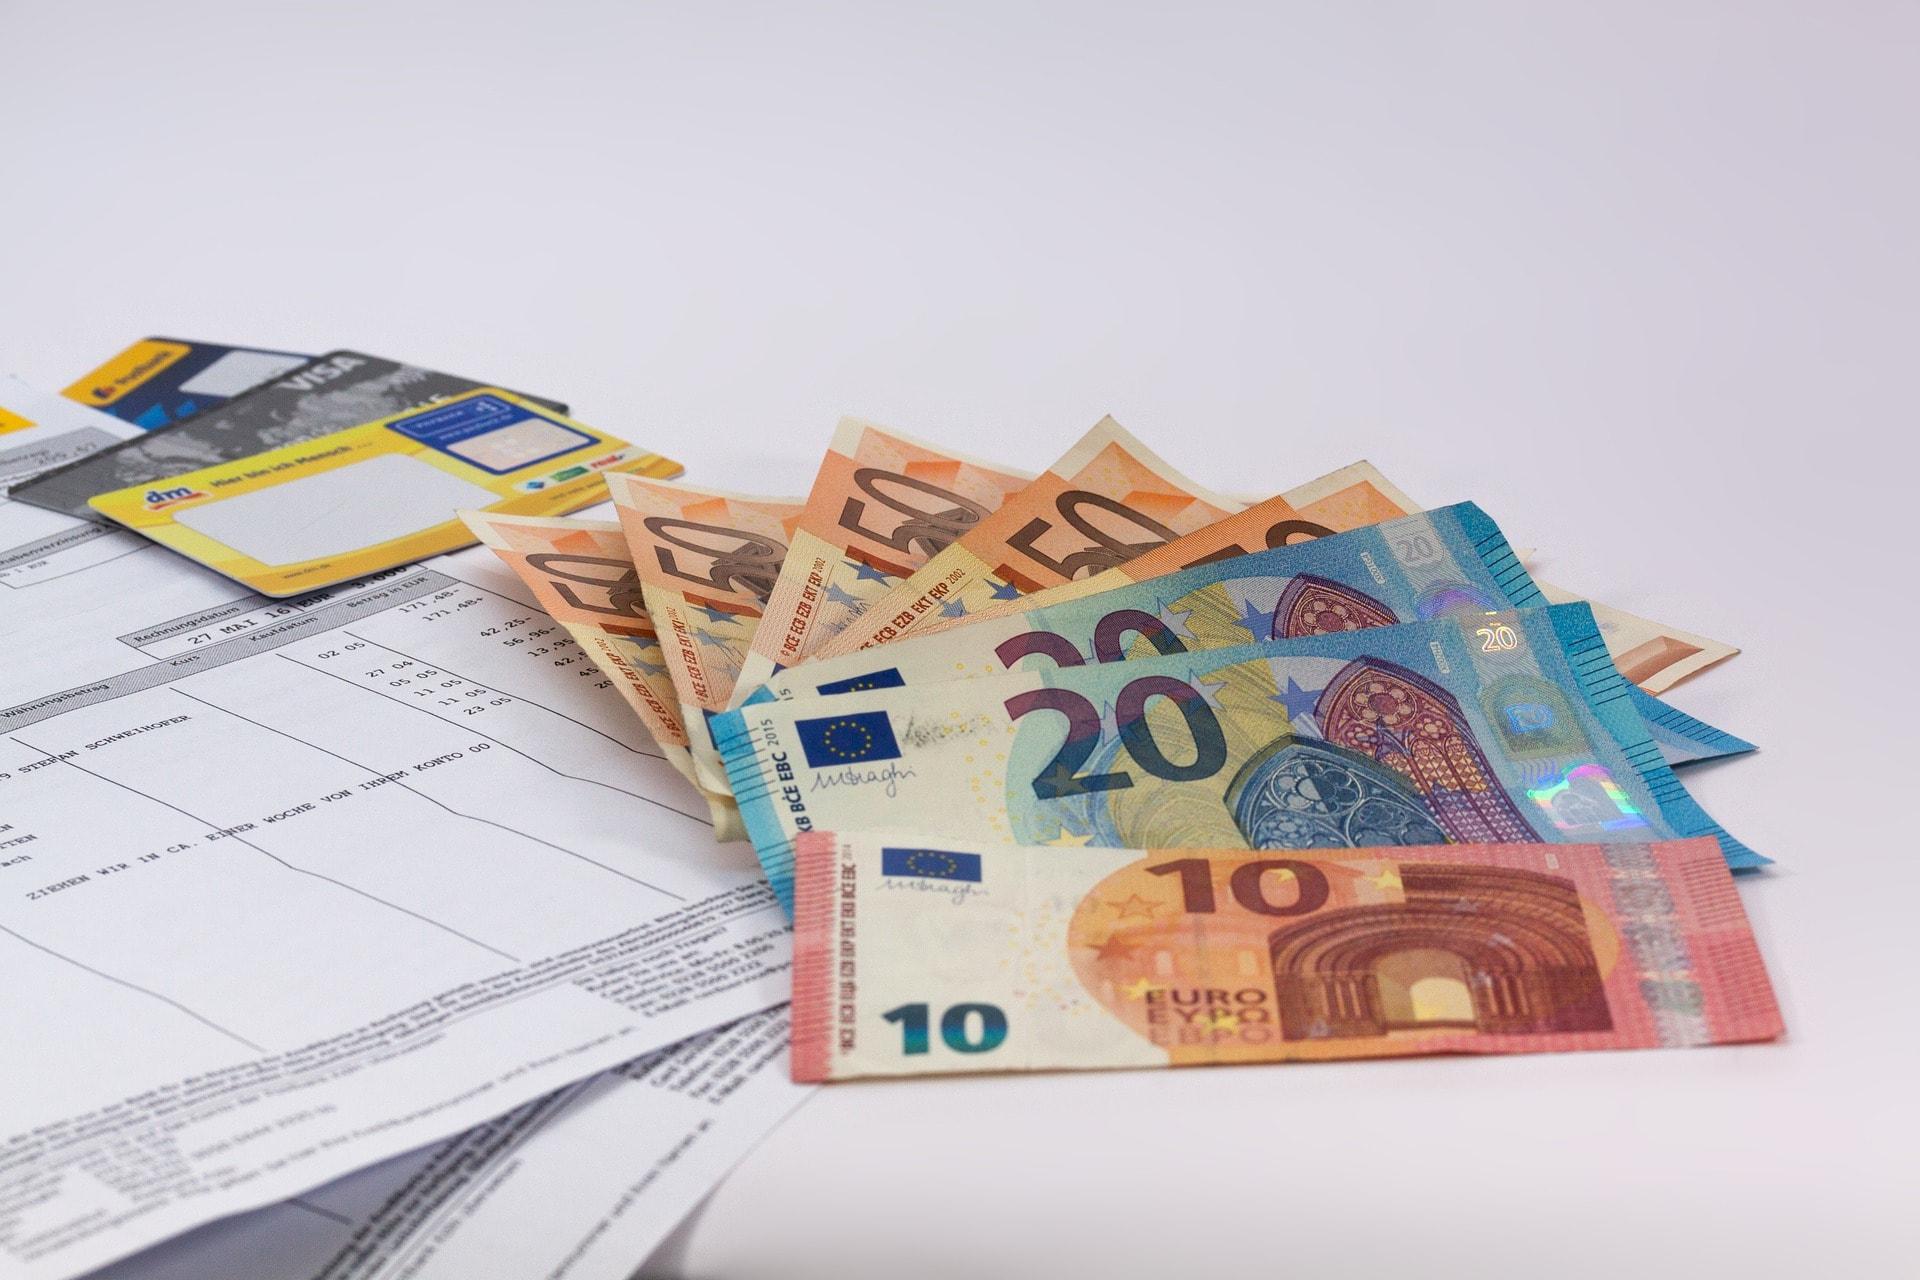 TransferWiseは留学にオススメの海外送金方法!そのメリットと使い方